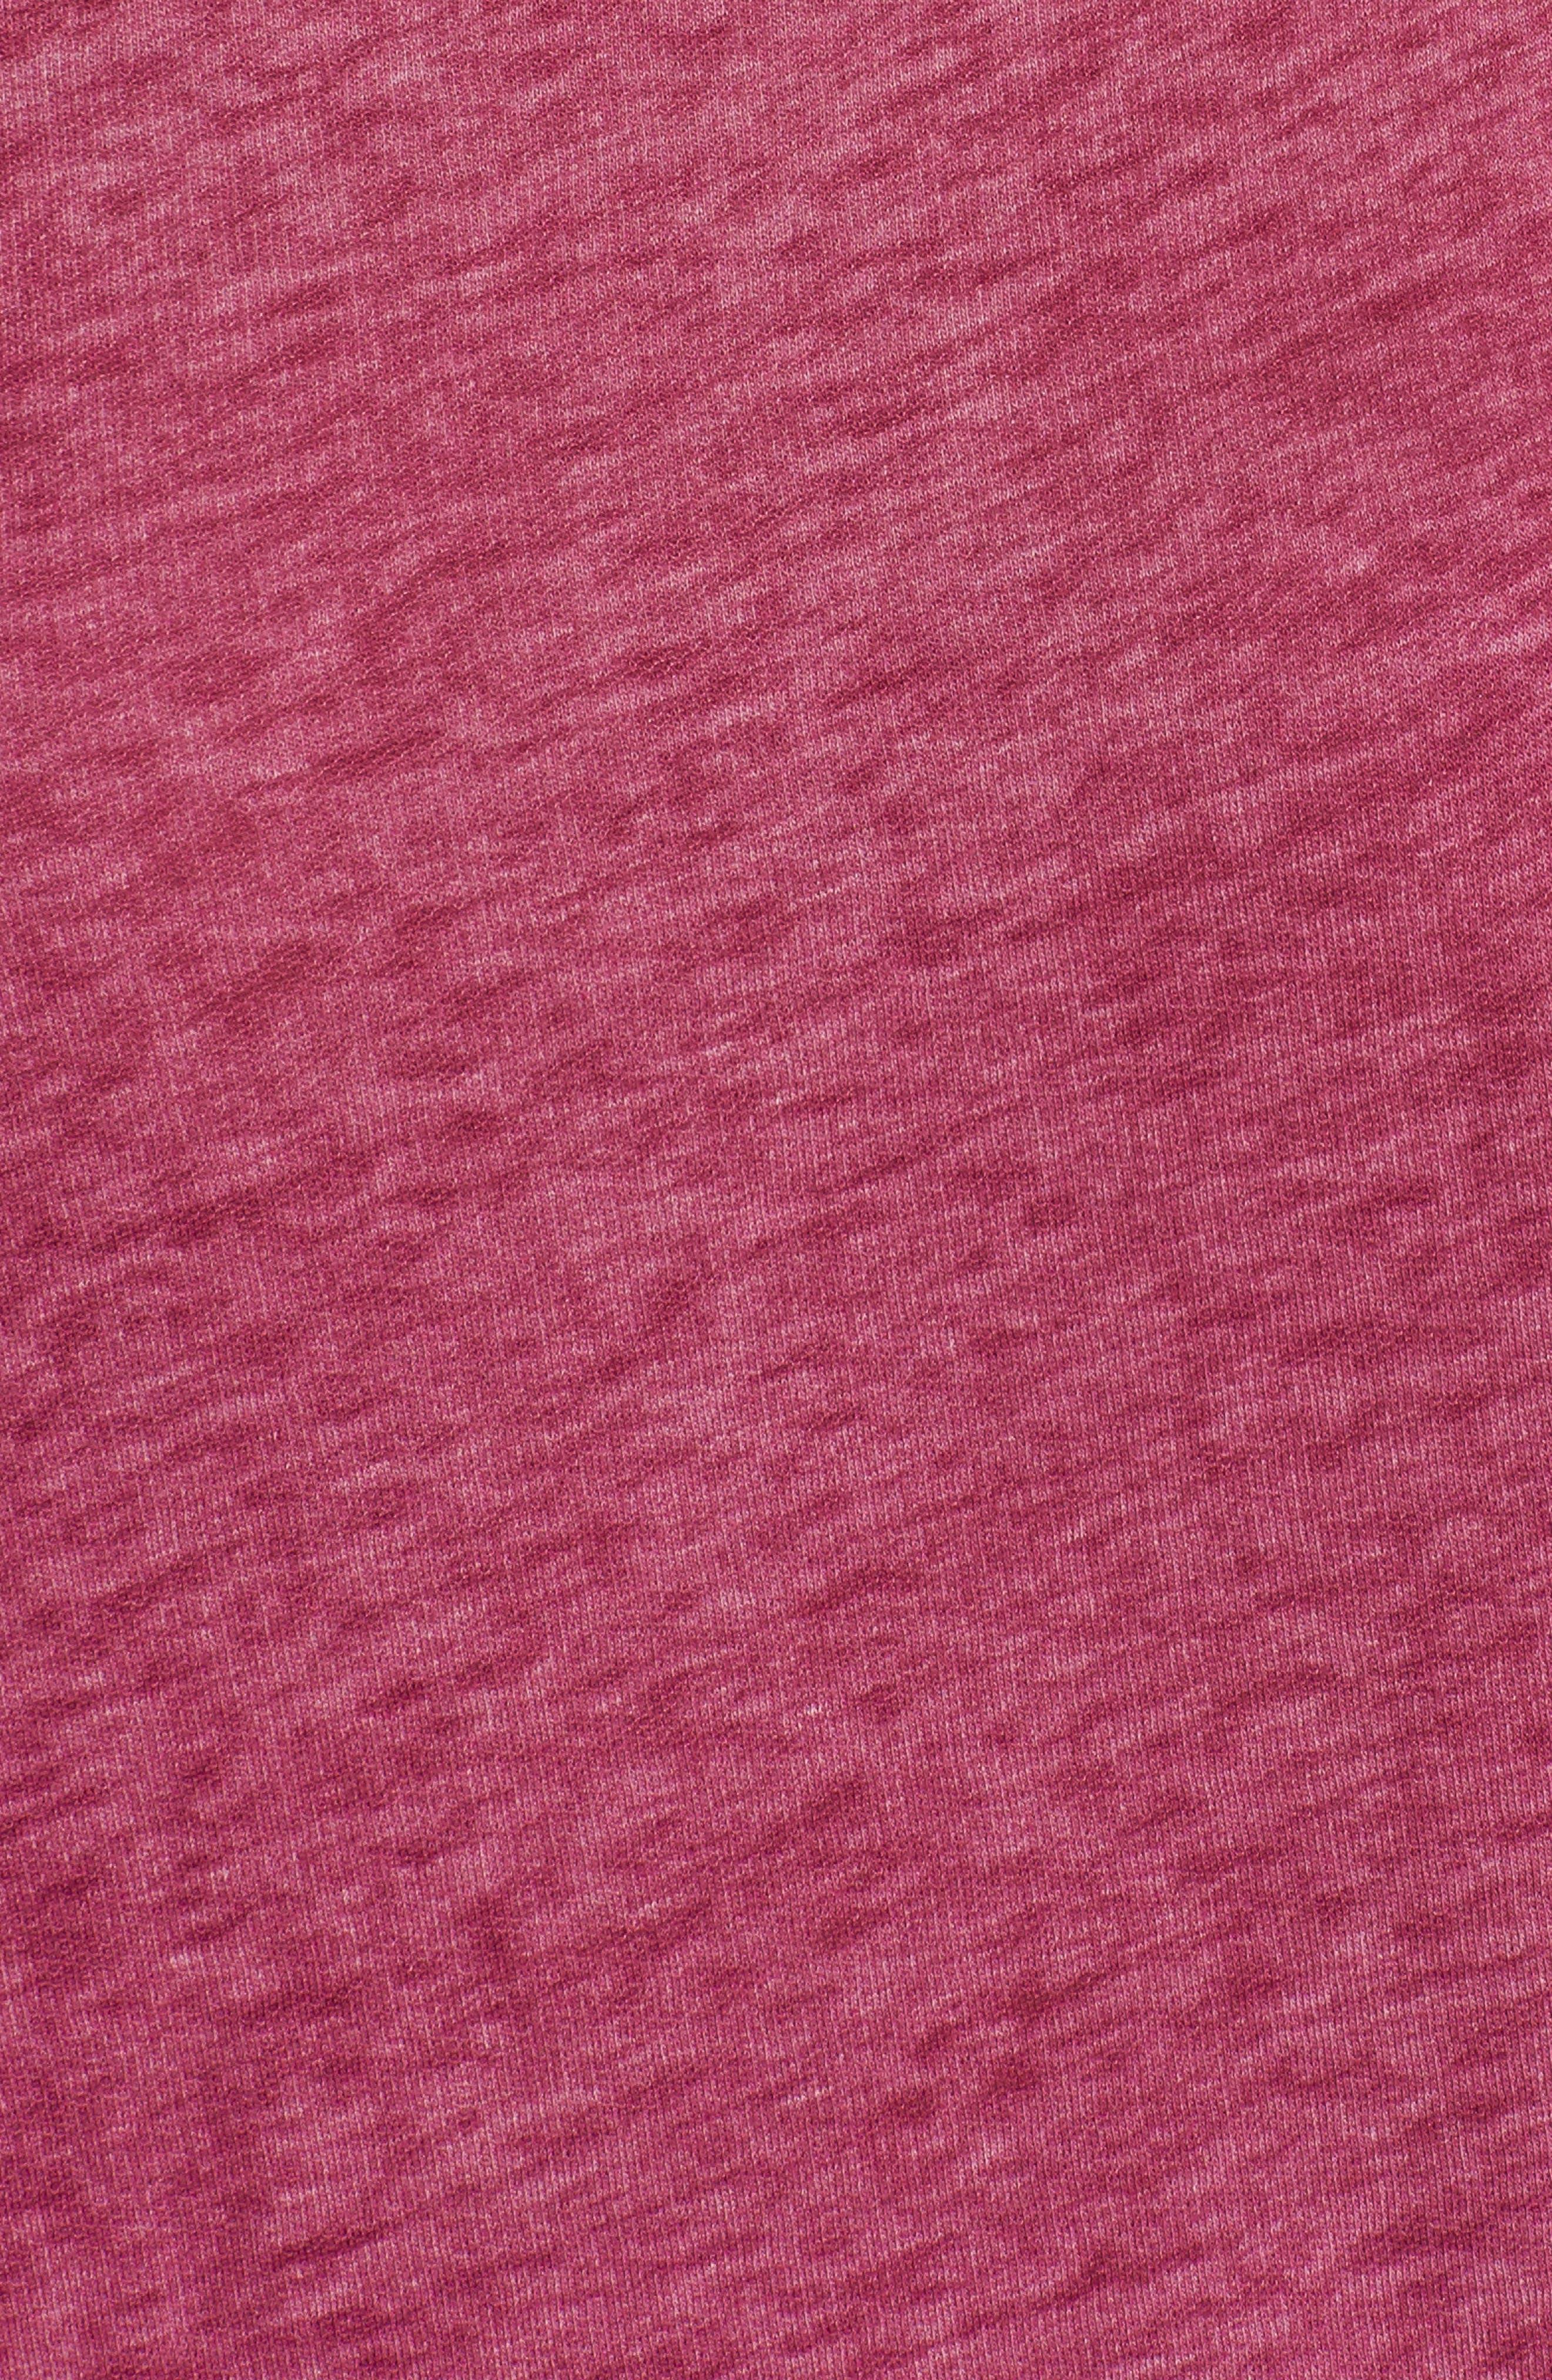 Bell Sleeve Sweatshirt,                             Alternate thumbnail 24, color,